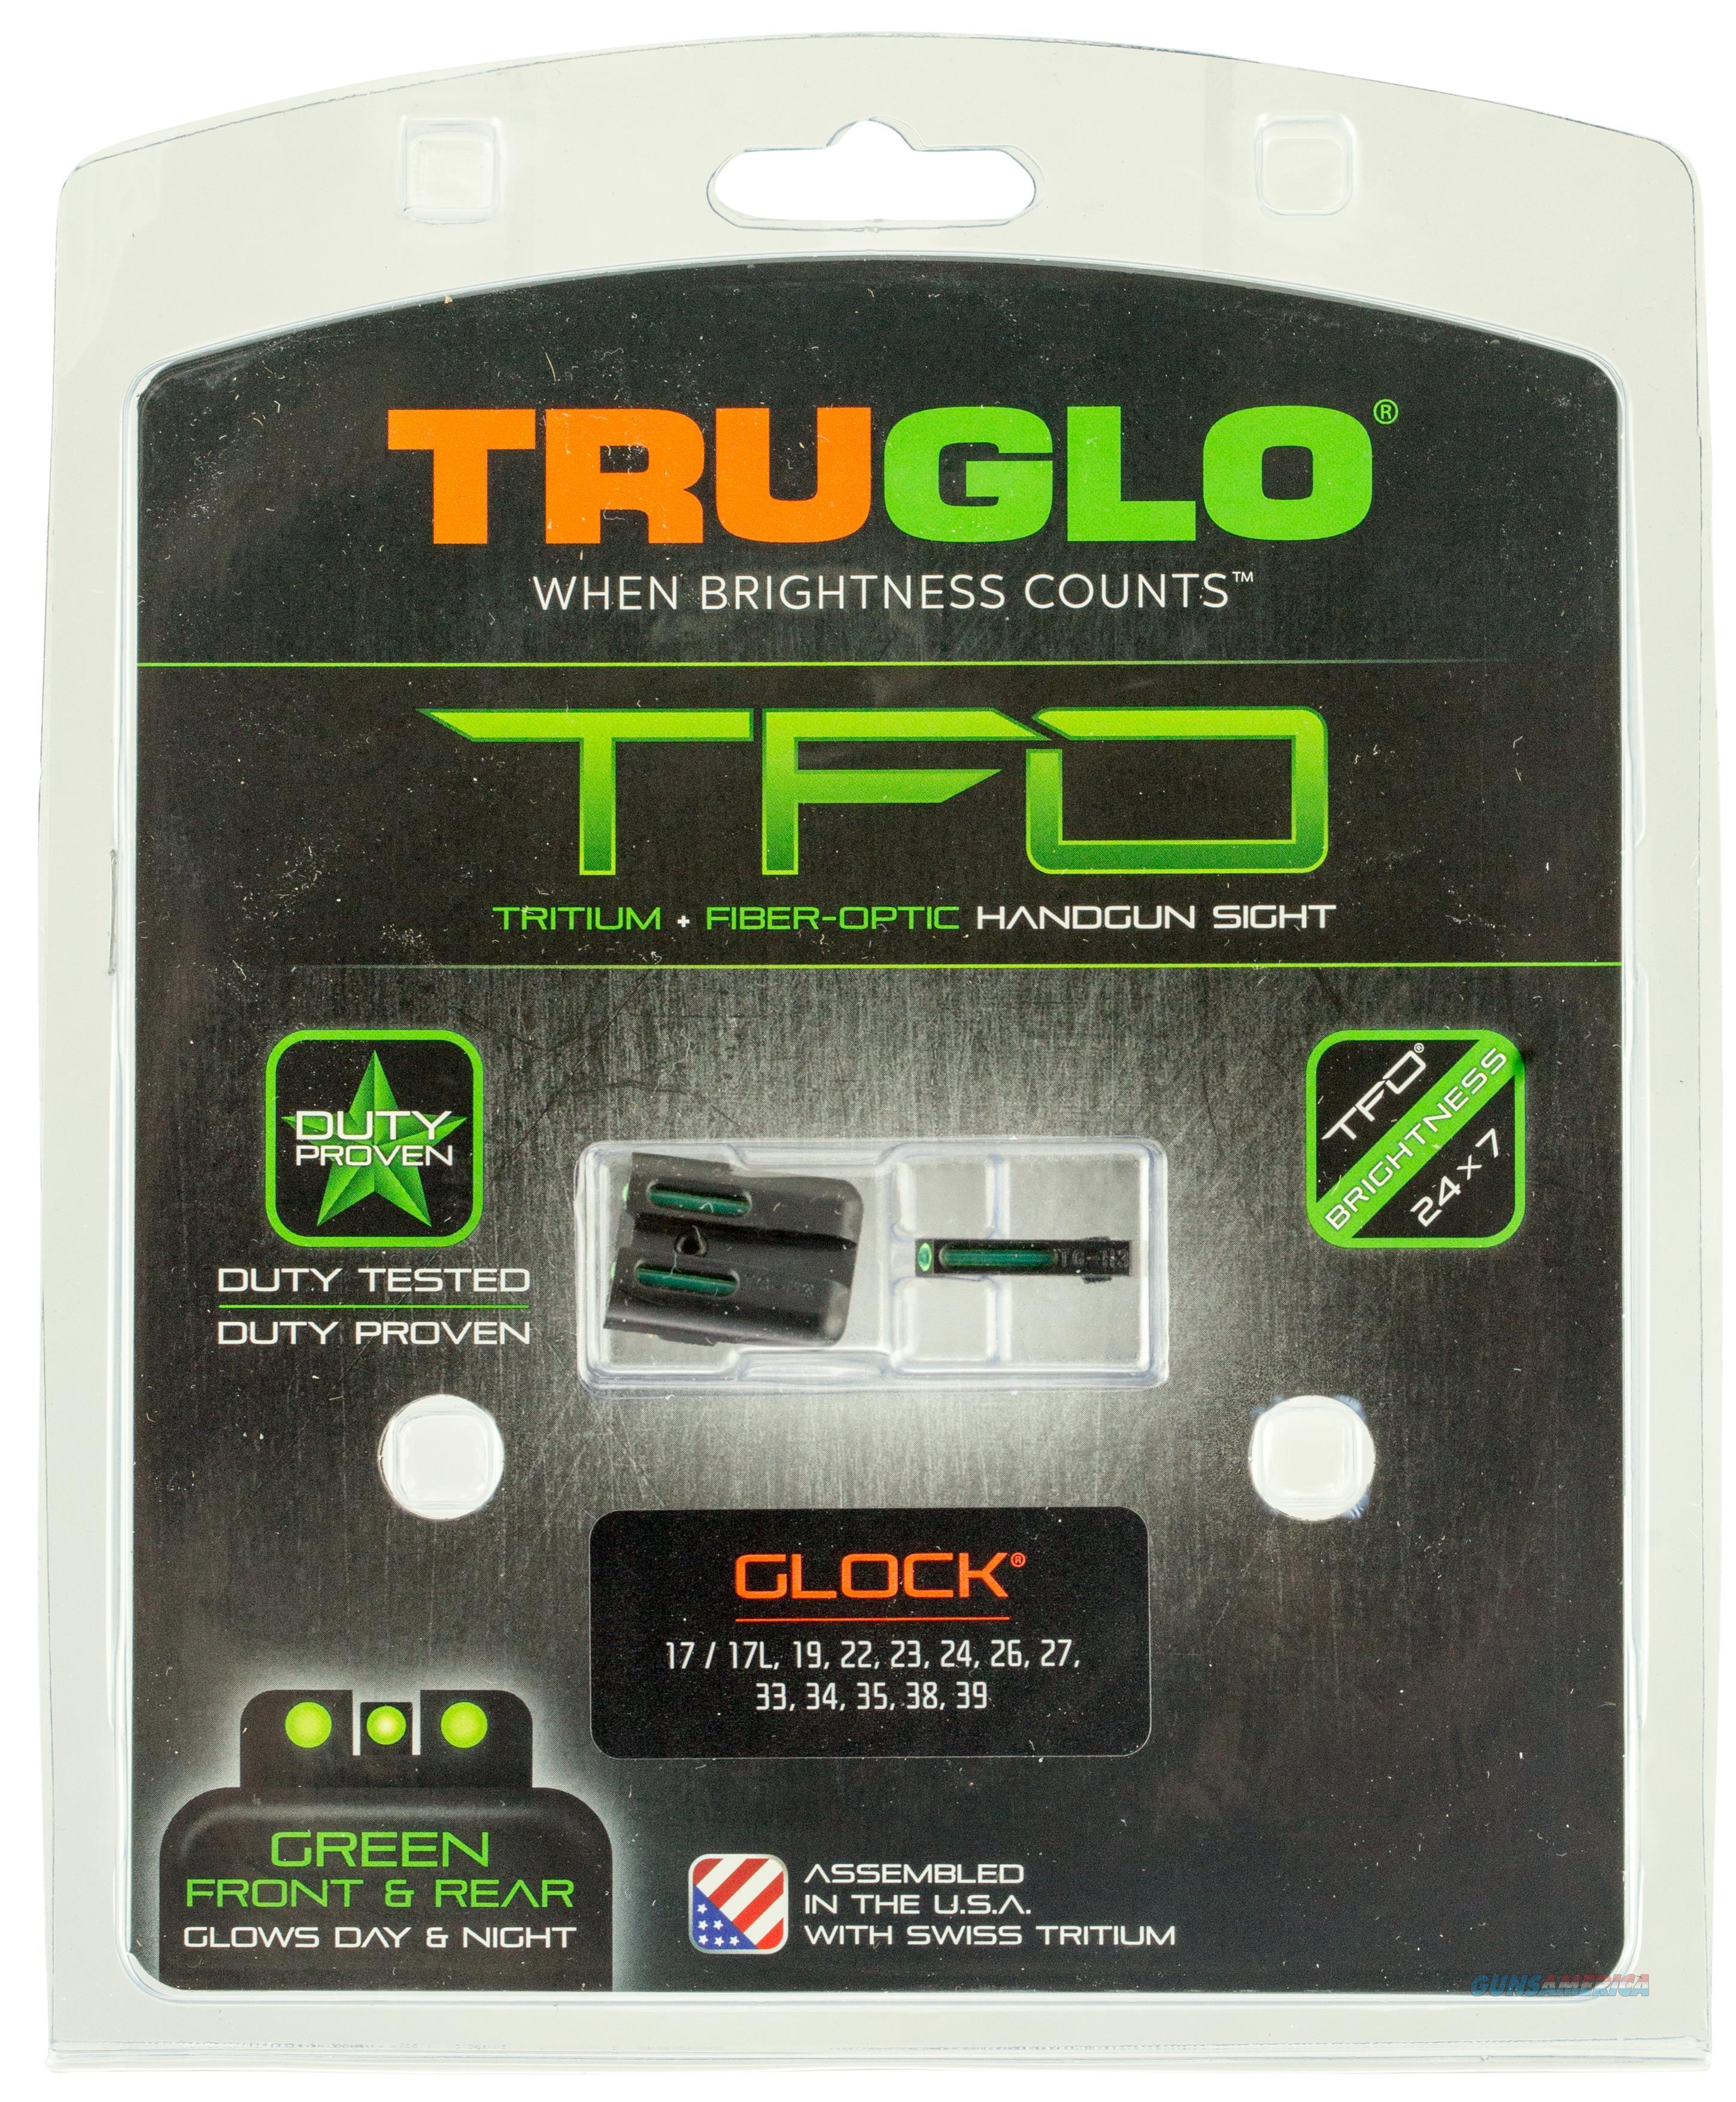 Truglo Tg131gt1 Brite-Site Tfo Glock 17/19/22/23/24/26/27/33/34/35/38/39 Tritium/Fiber Optic Green Black TG131GT1  Non-Guns > Iron/Metal/Peep Sights